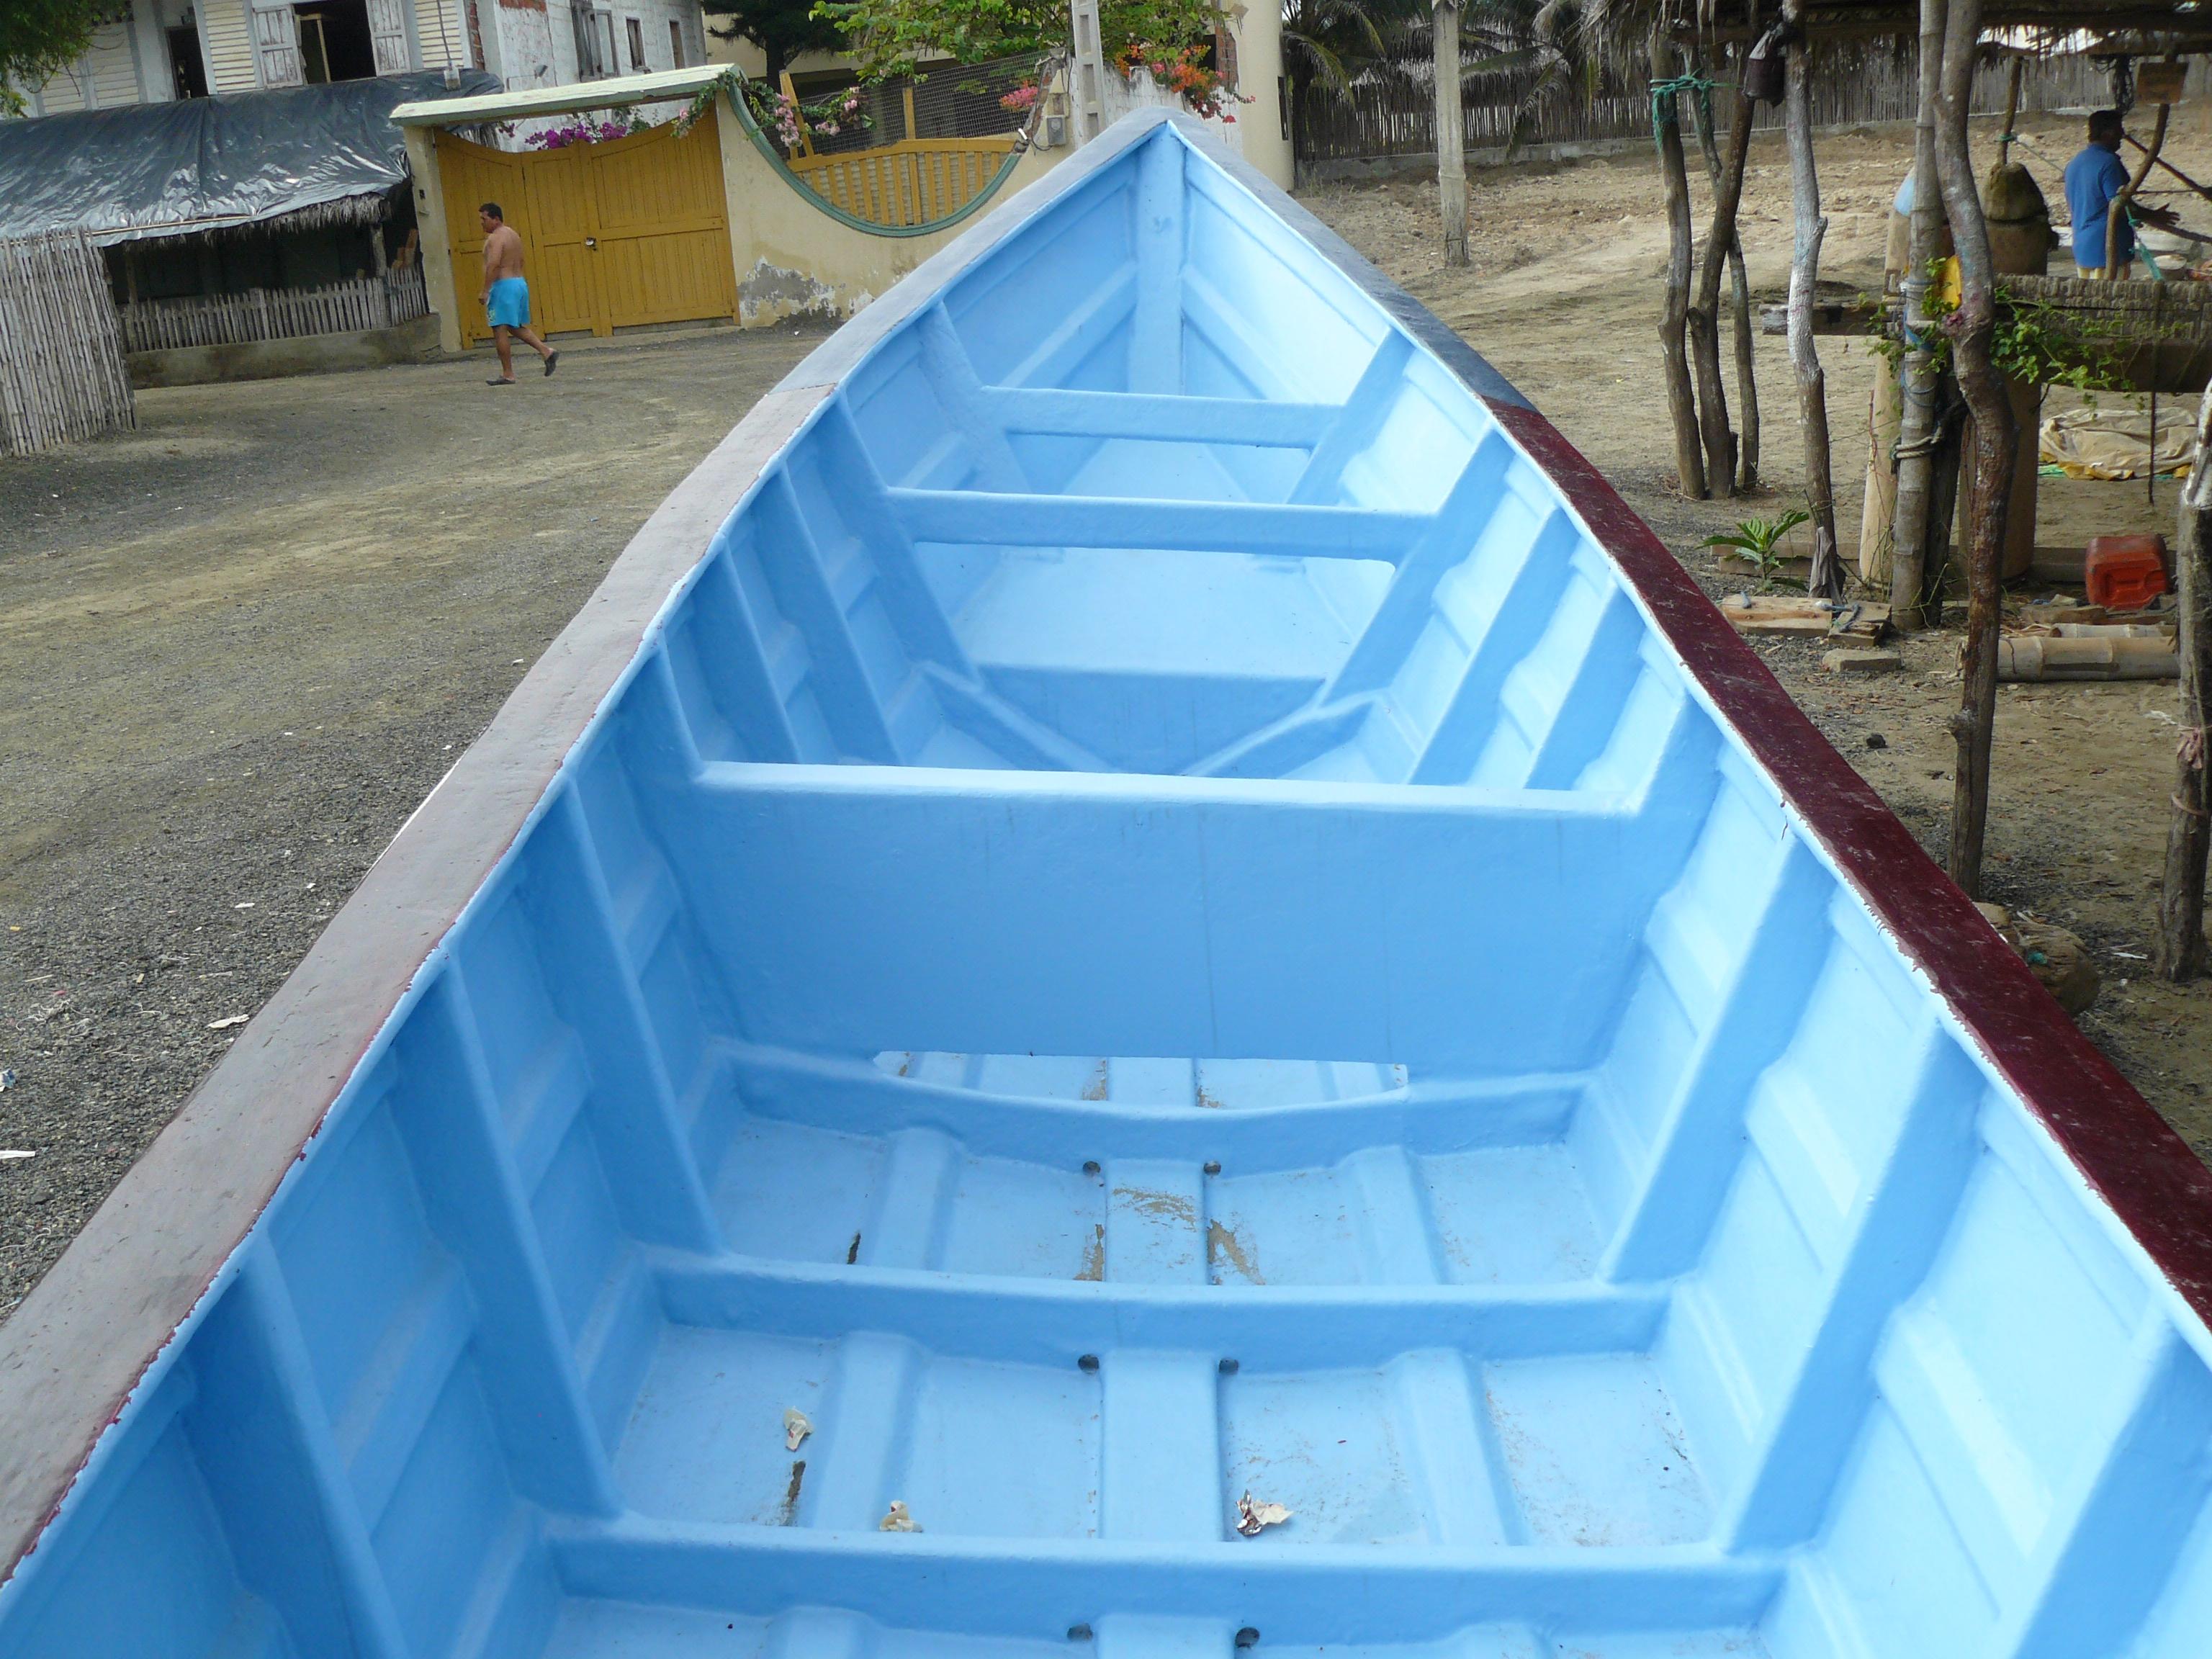 Fiberglass Sailboat Plans Free Download How To Build Wood